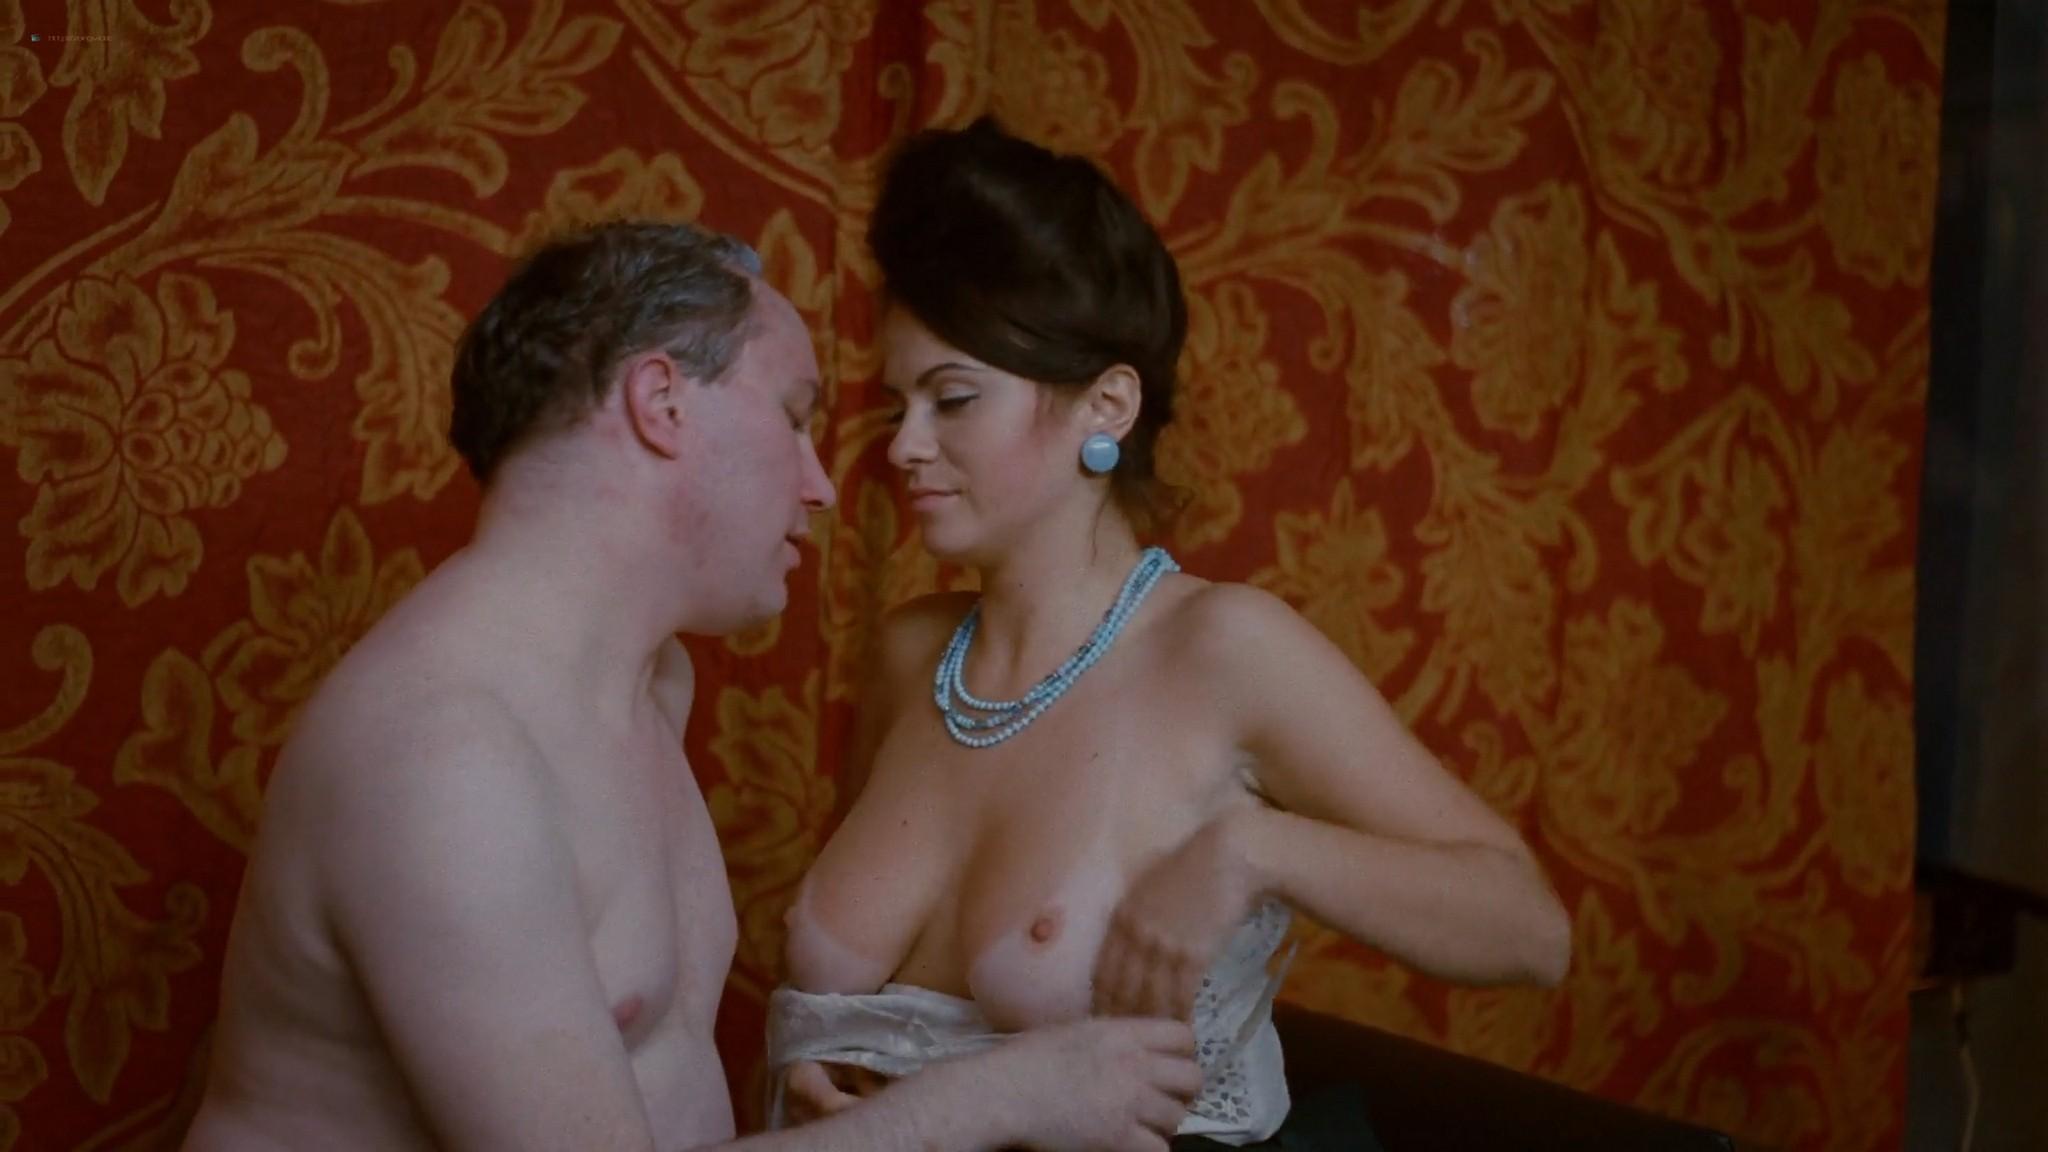 Kristina Babich nude sex Viktoria Skitskaya, Kristina Voloshina nude too- DAU Degeneratsiya (2020) HD 1080p (12)